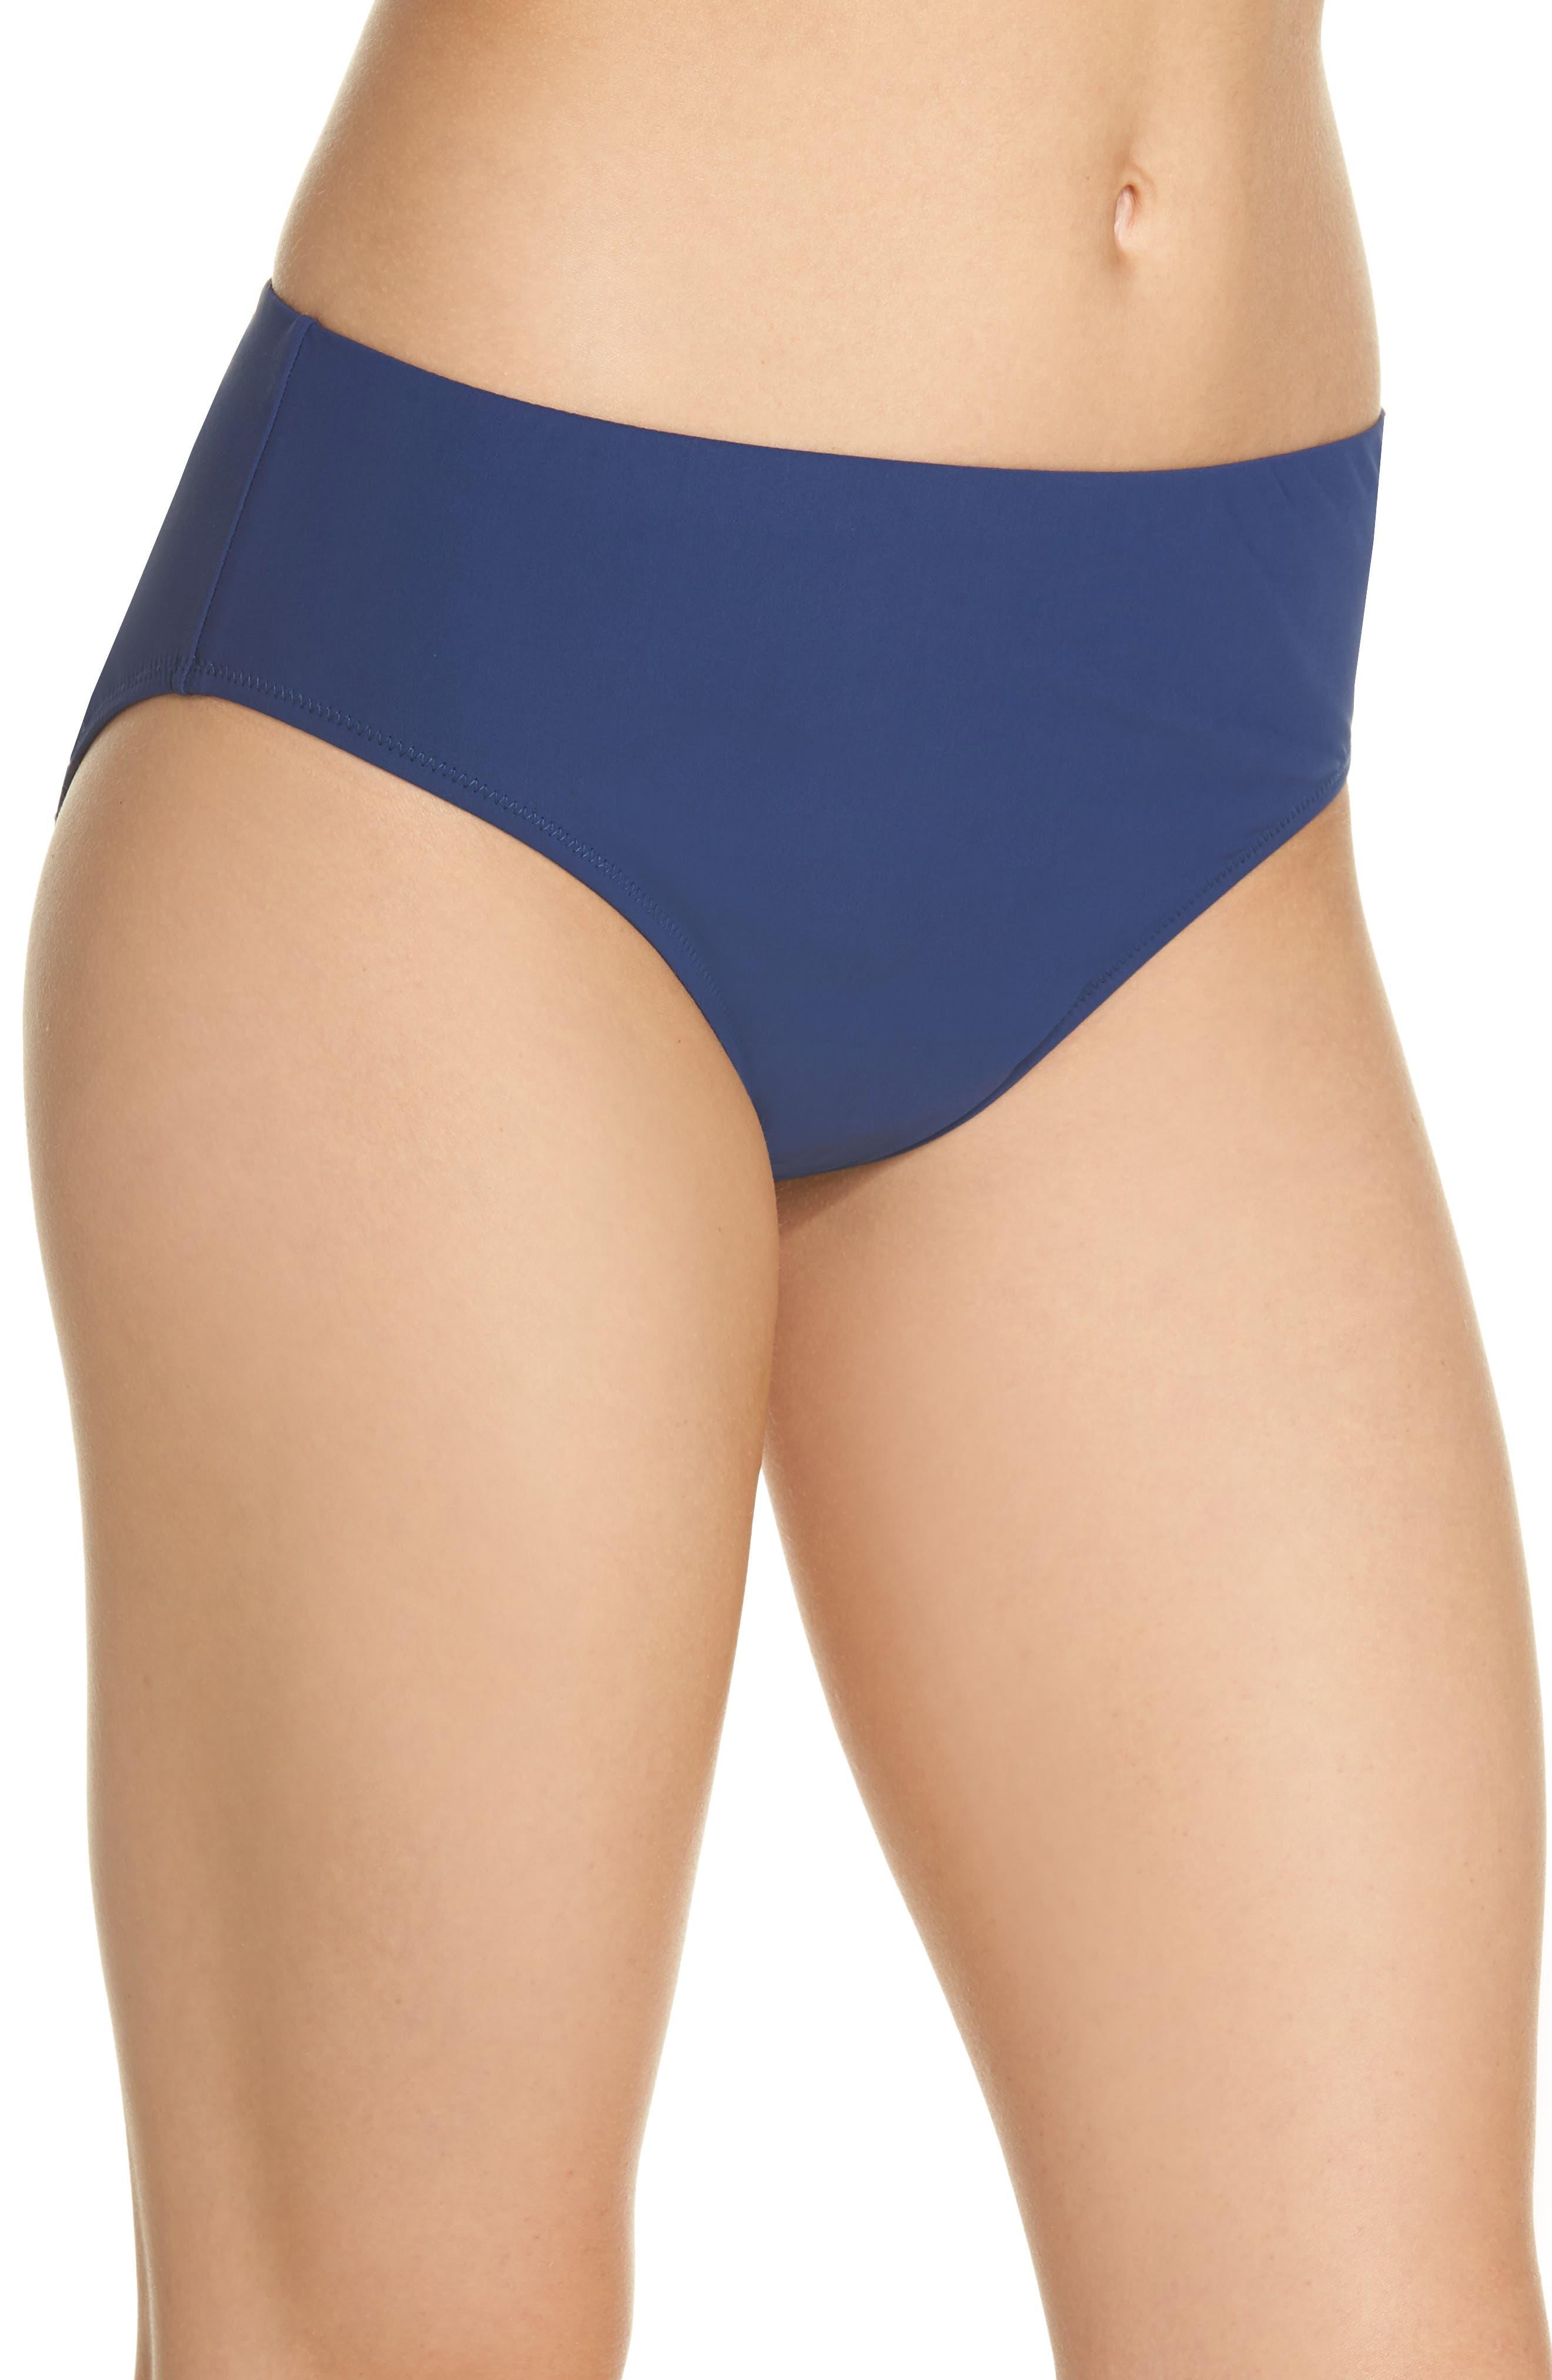 PROFILE BY GOTTEX,                             Hipster Bikini Bottoms,                             Alternate thumbnail 3, color,                             427